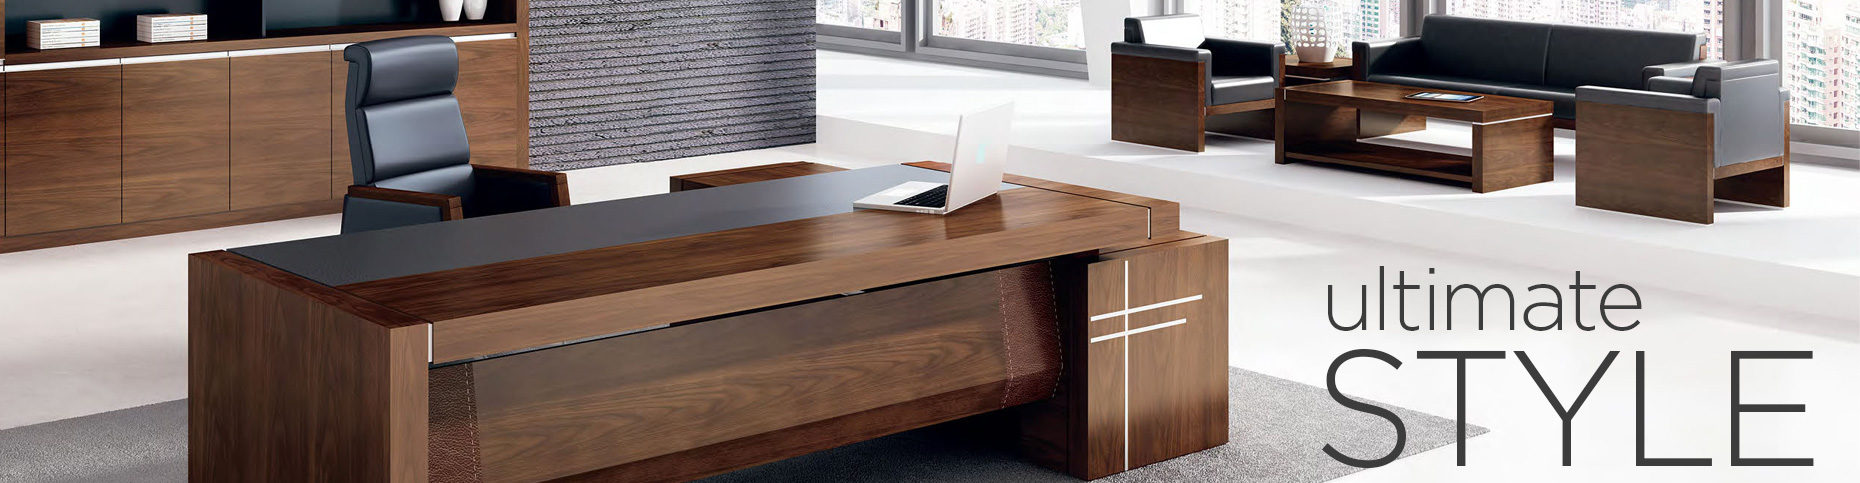 Moropa Office Furniture